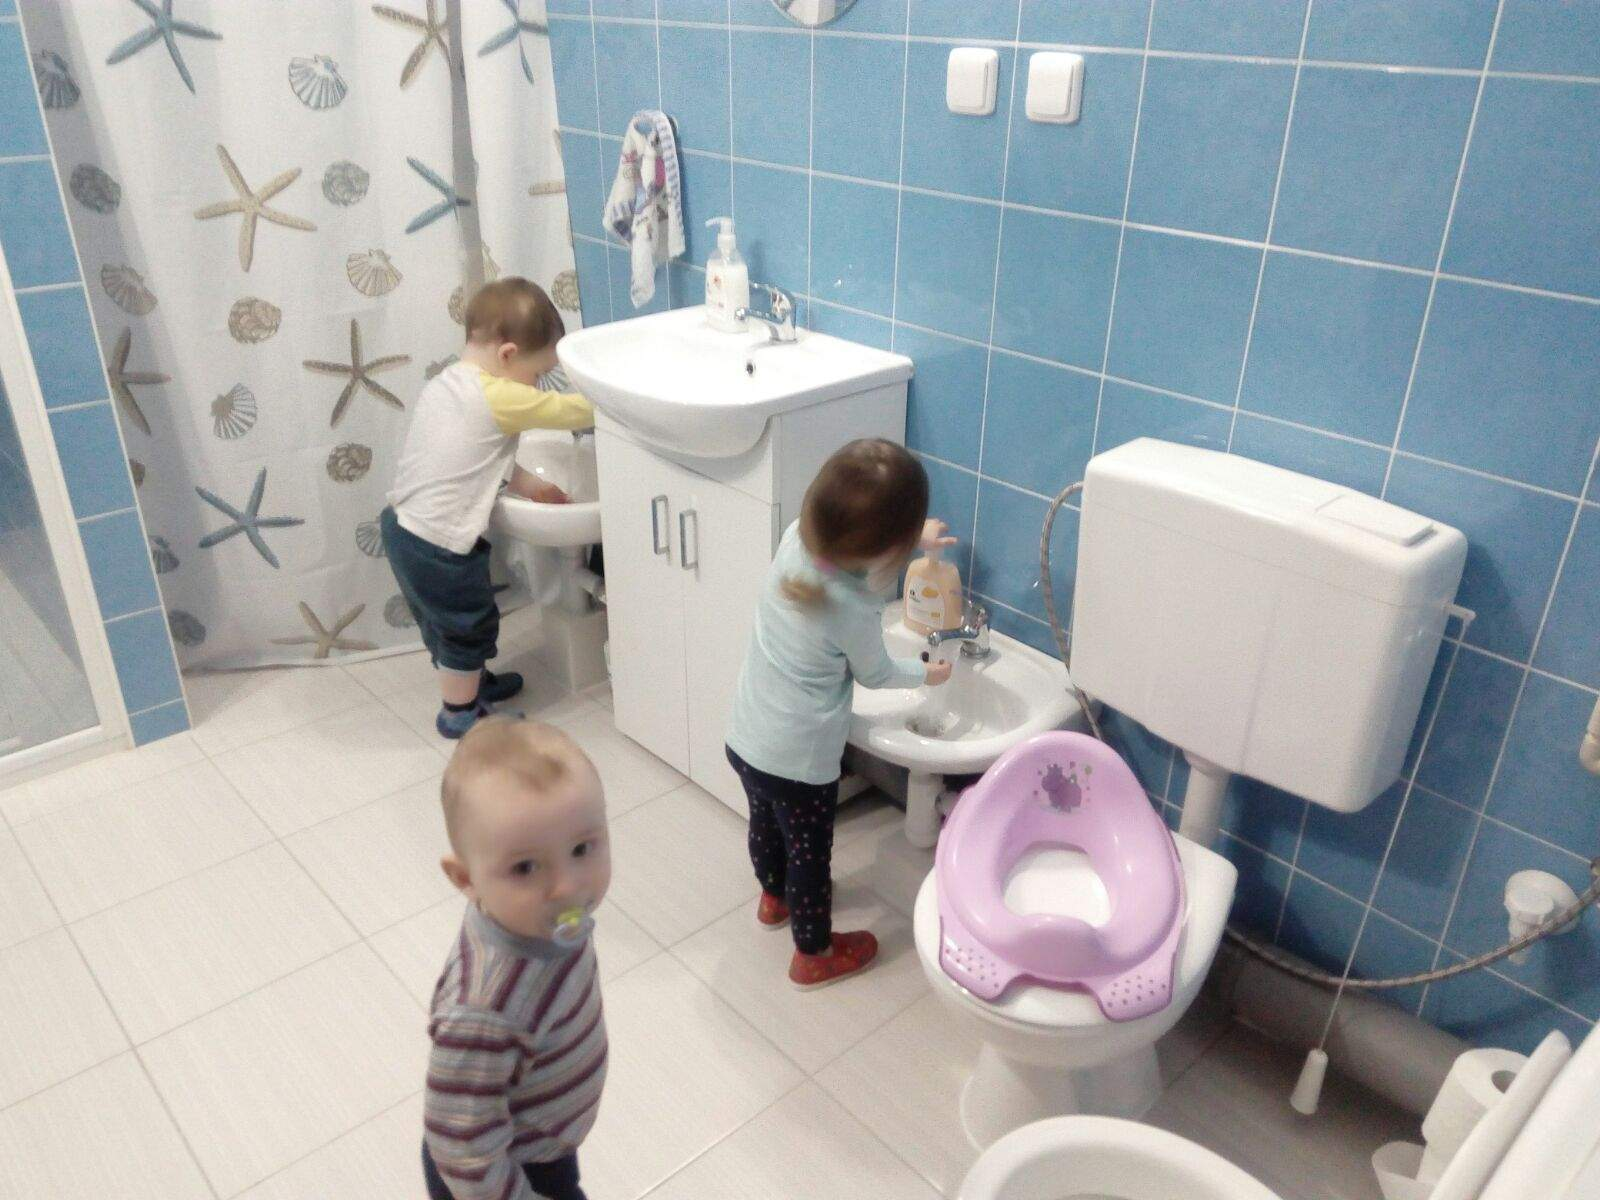 rajce.idnes.cz. toilet matyaskawulok - Idnes